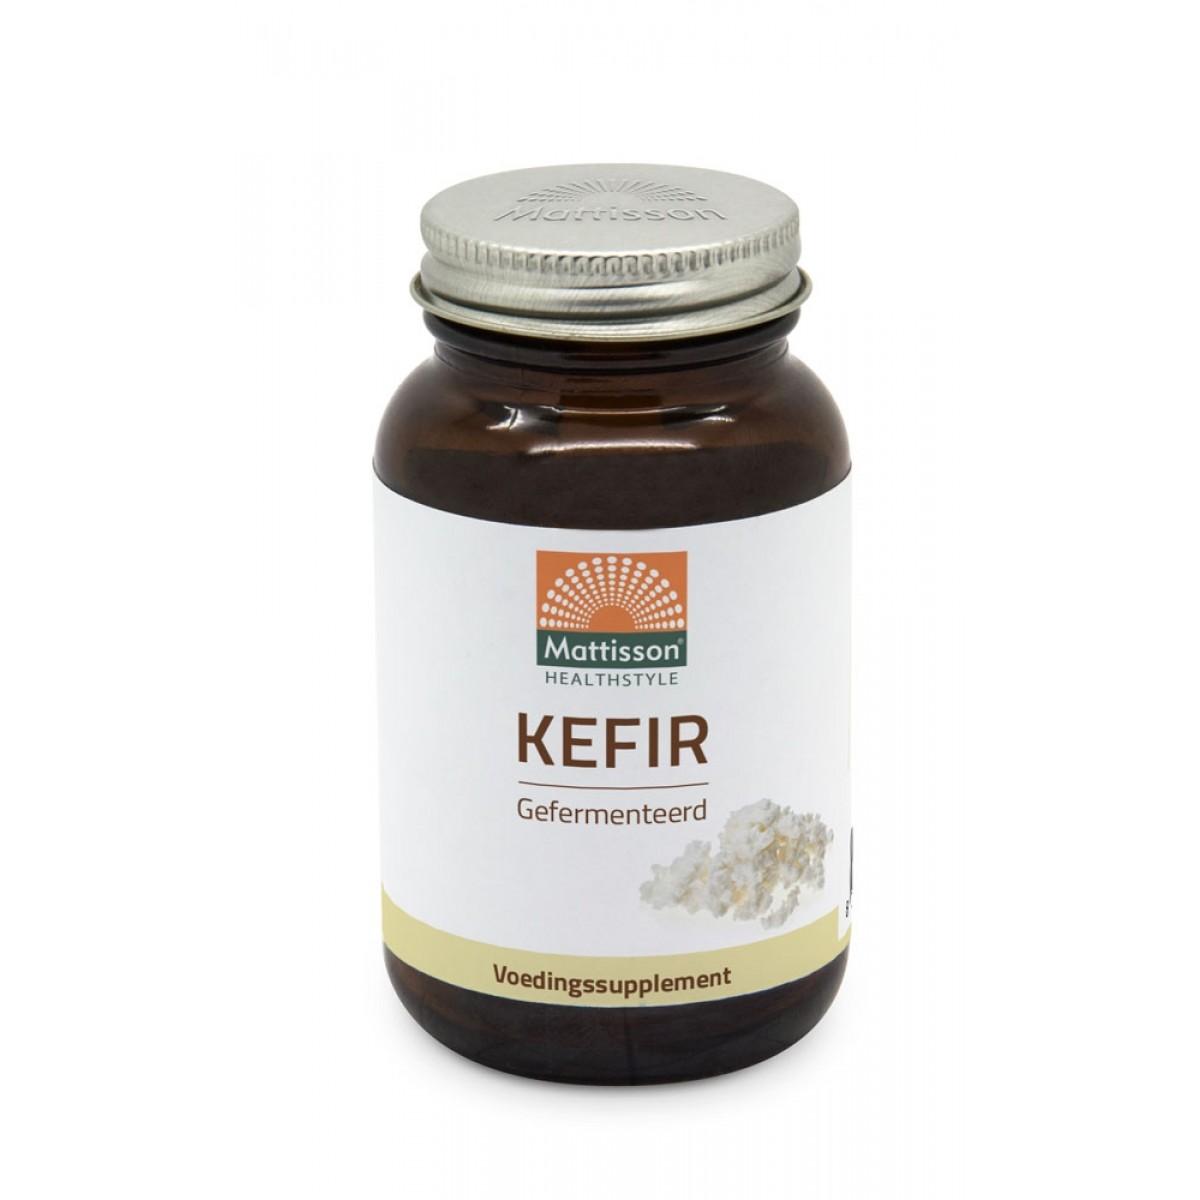 Kefir Gefermenteerd Probiotica